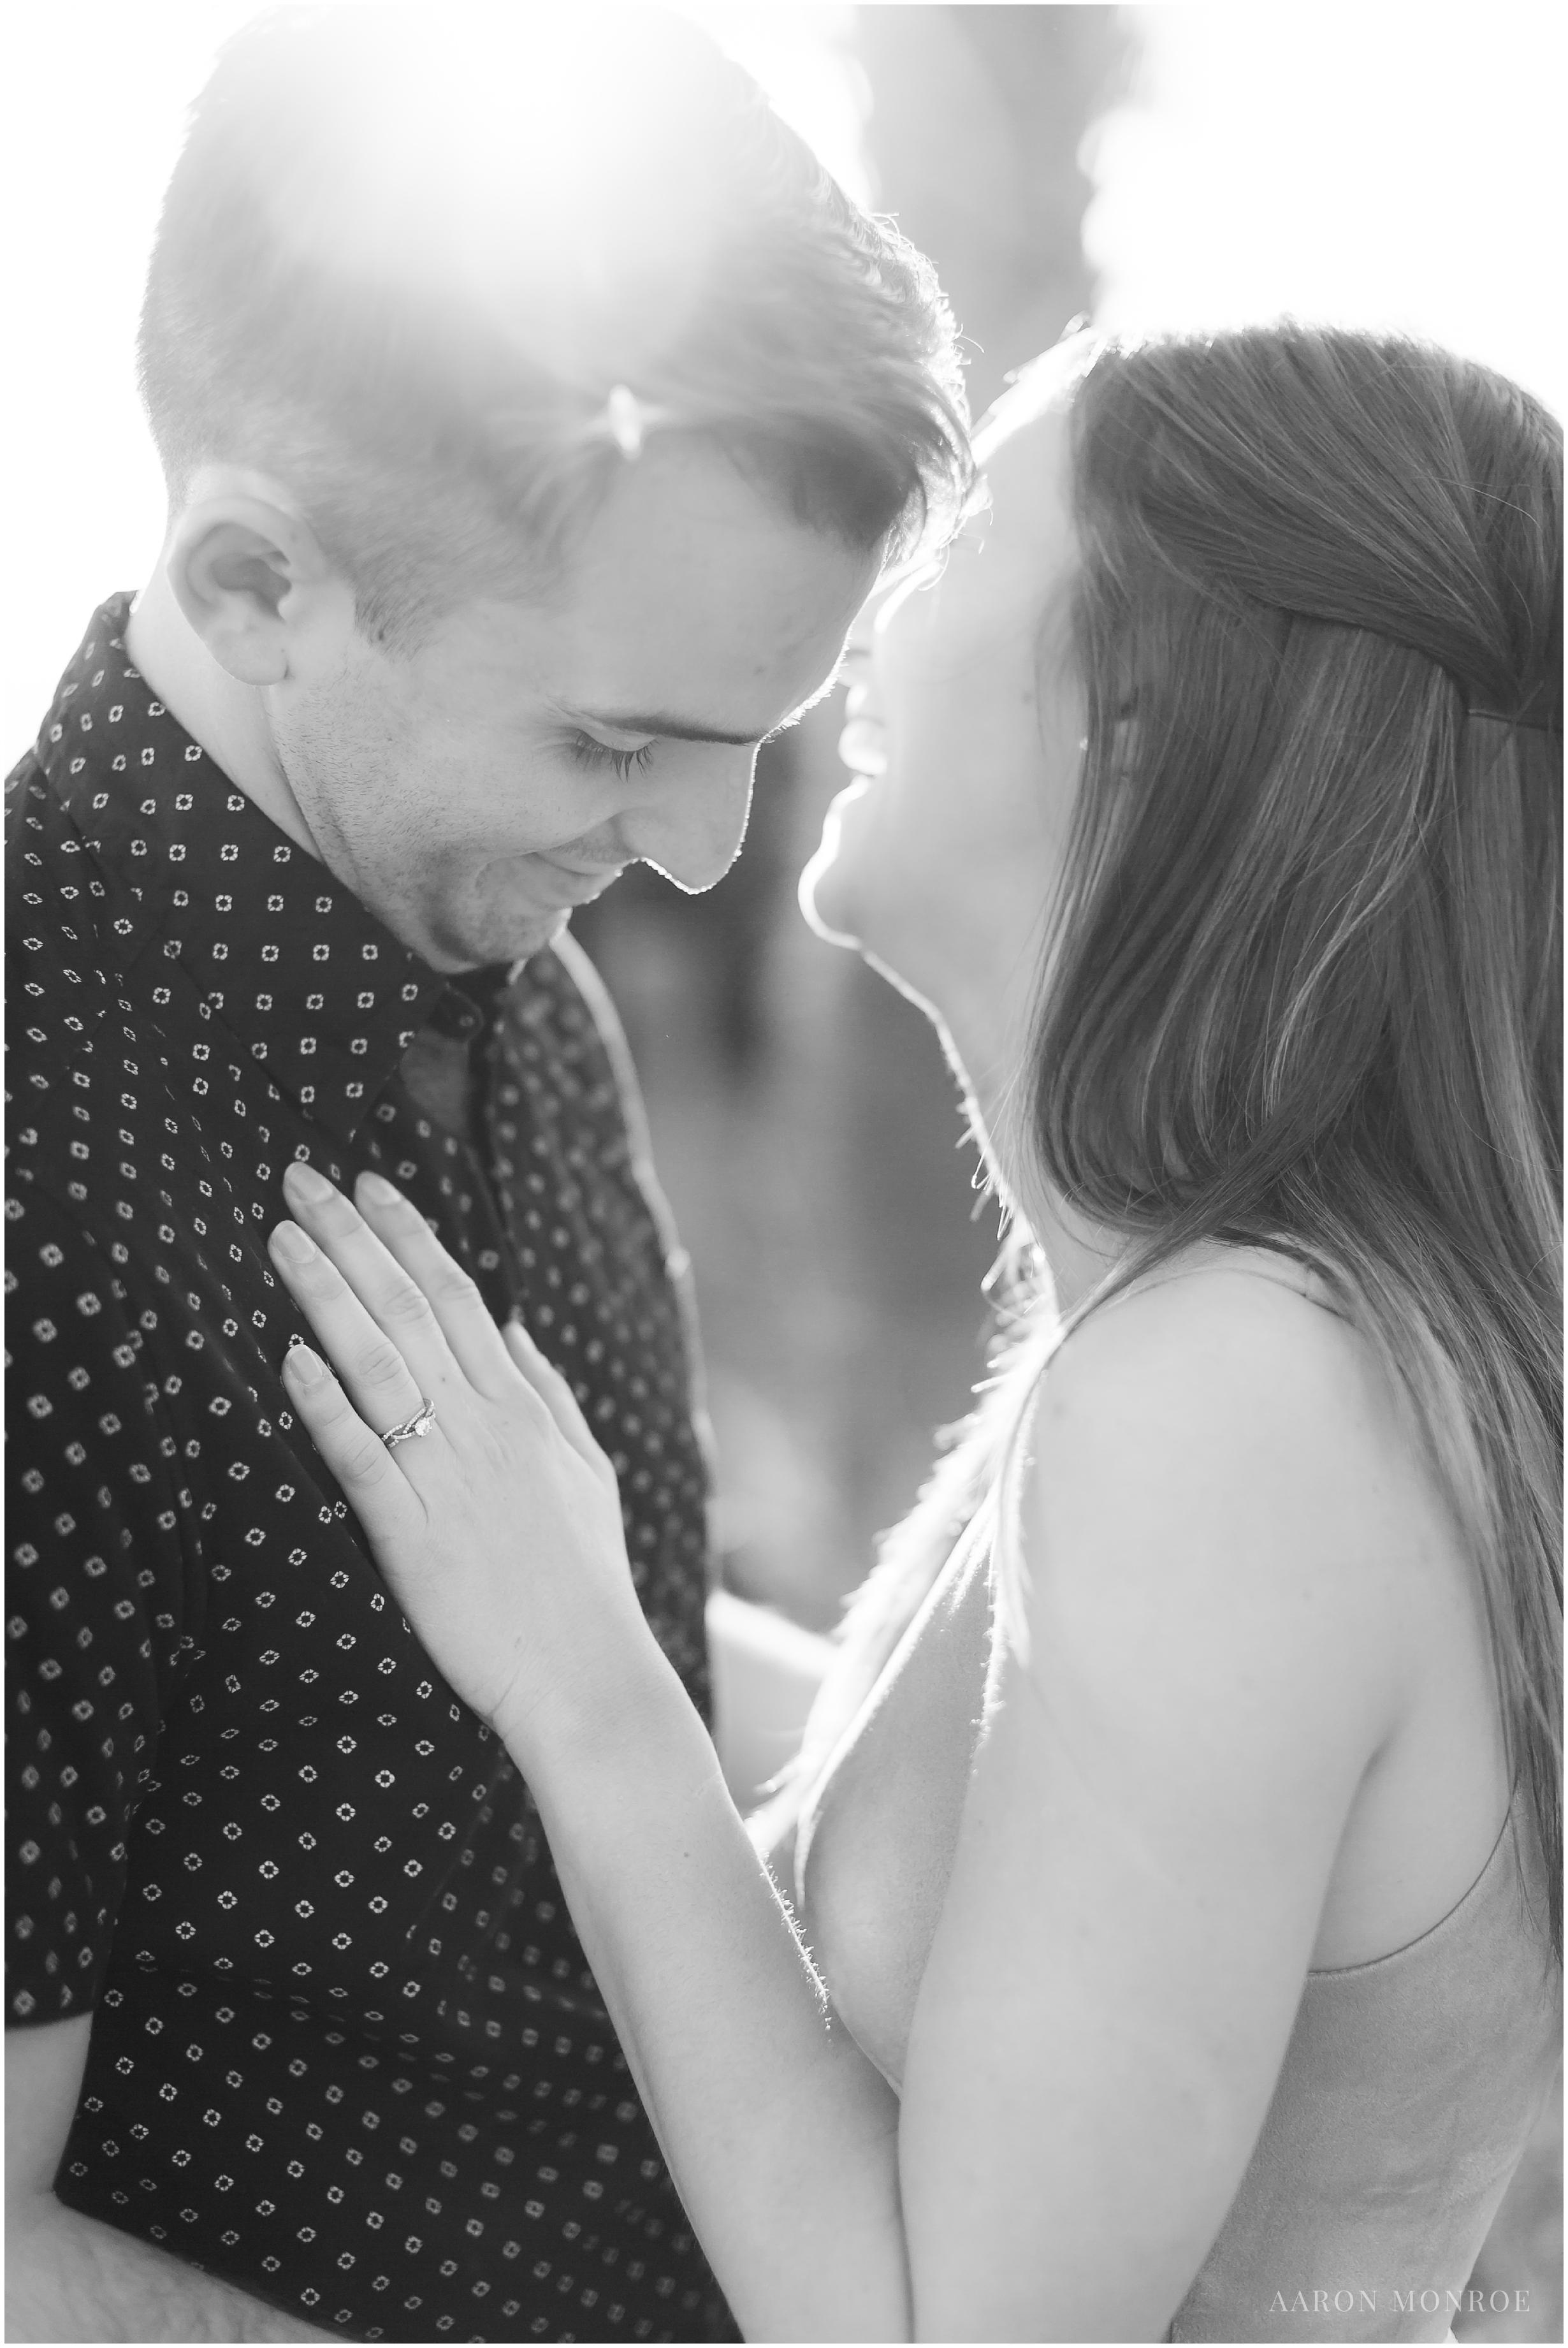 Abalone_Cove_Engagement_Los_Angeles_Wedding_Photographer_0266.jpg